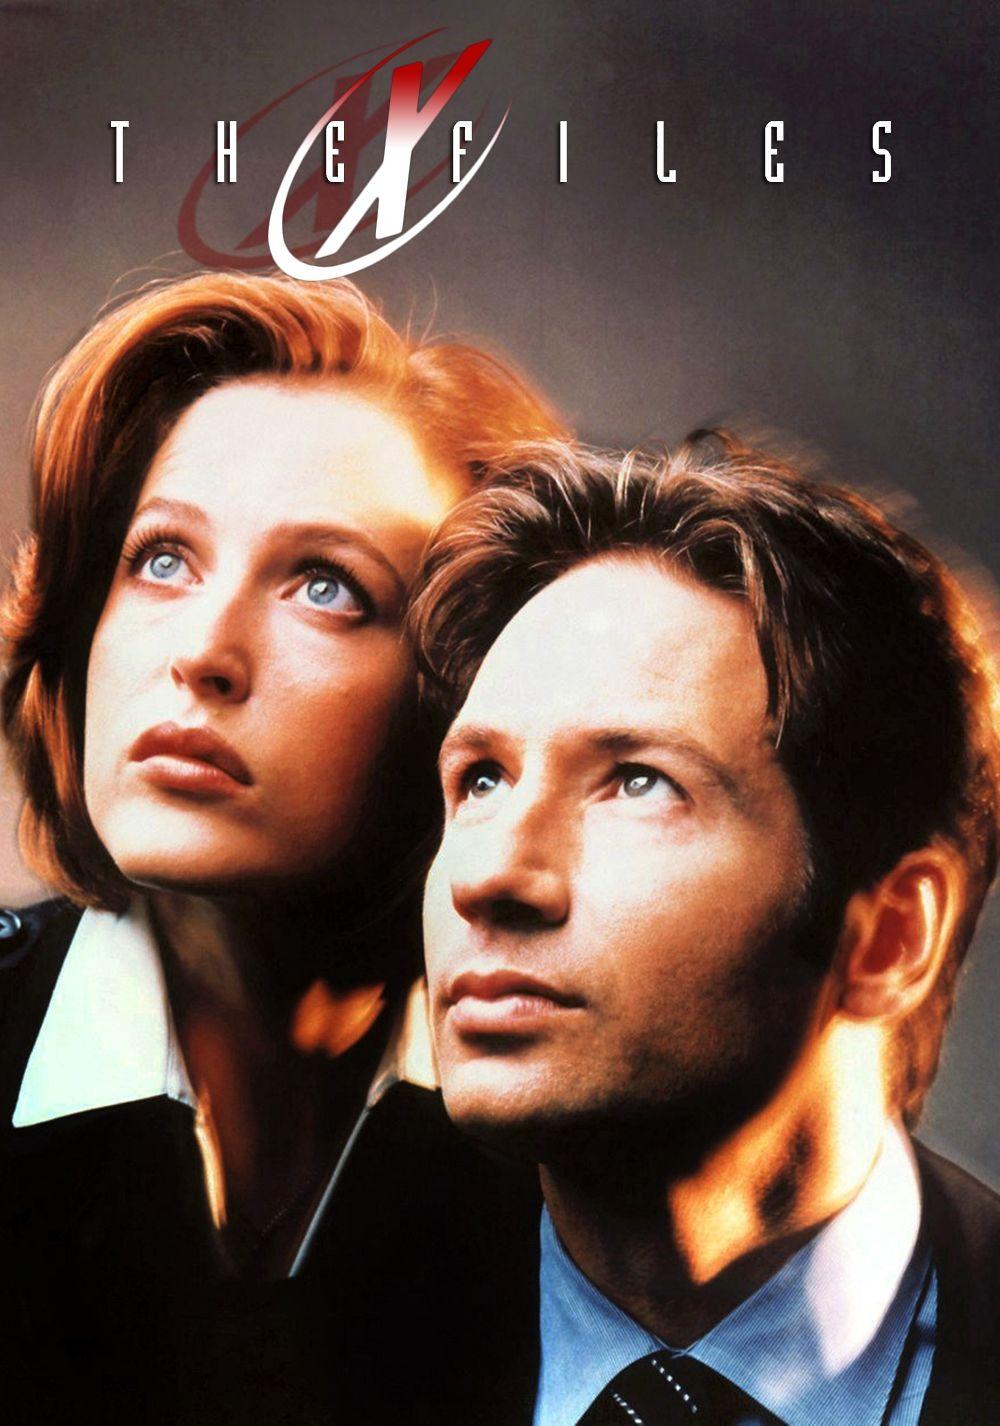 The X-Files Serie Completa Dual Latino/Ingles 1080p